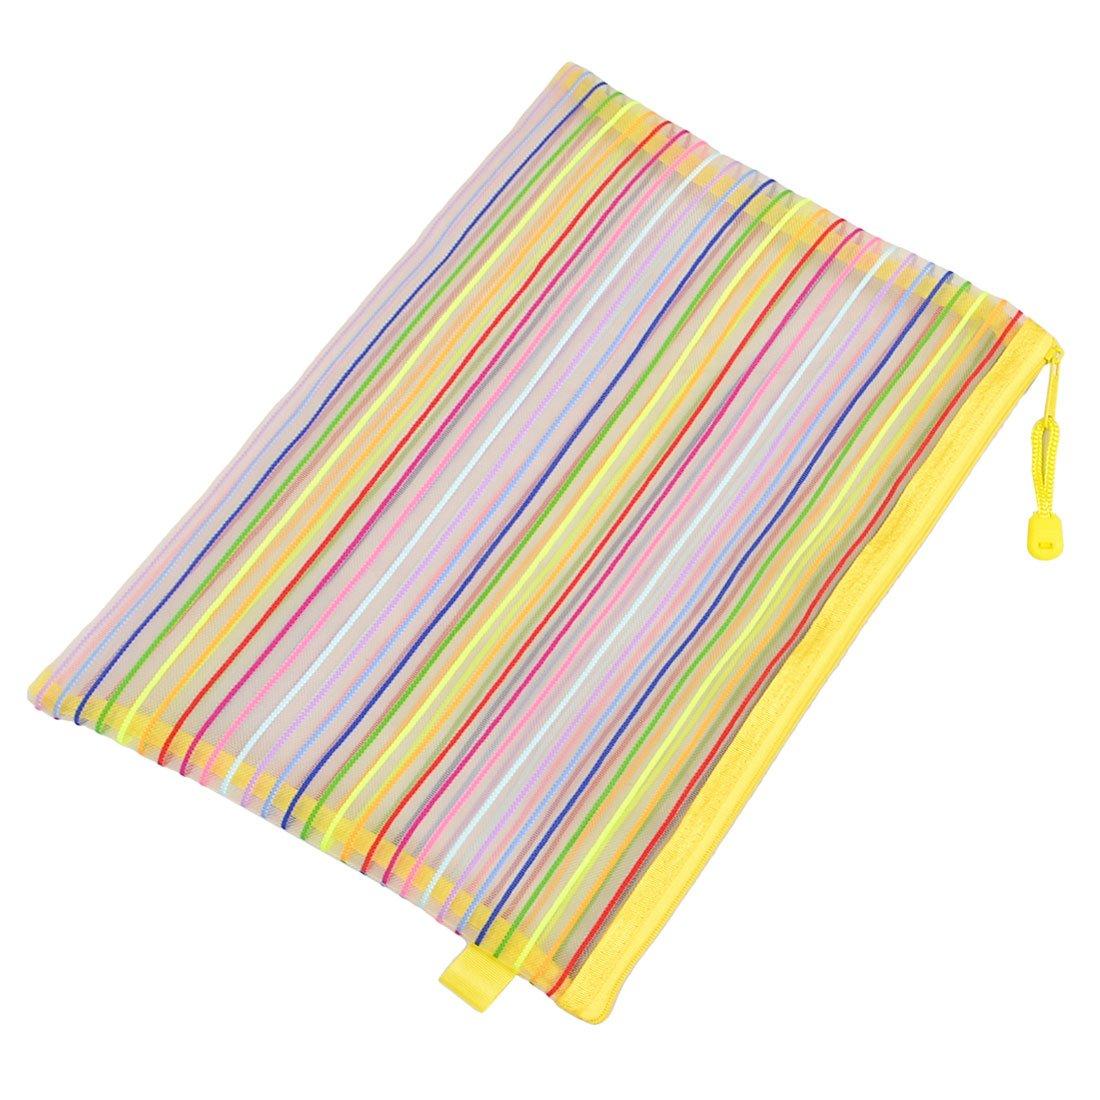 Perfect- Zip Up Nylon Mesh Multicolor Stripes A4 Paper Documents Pen File Bag Folder